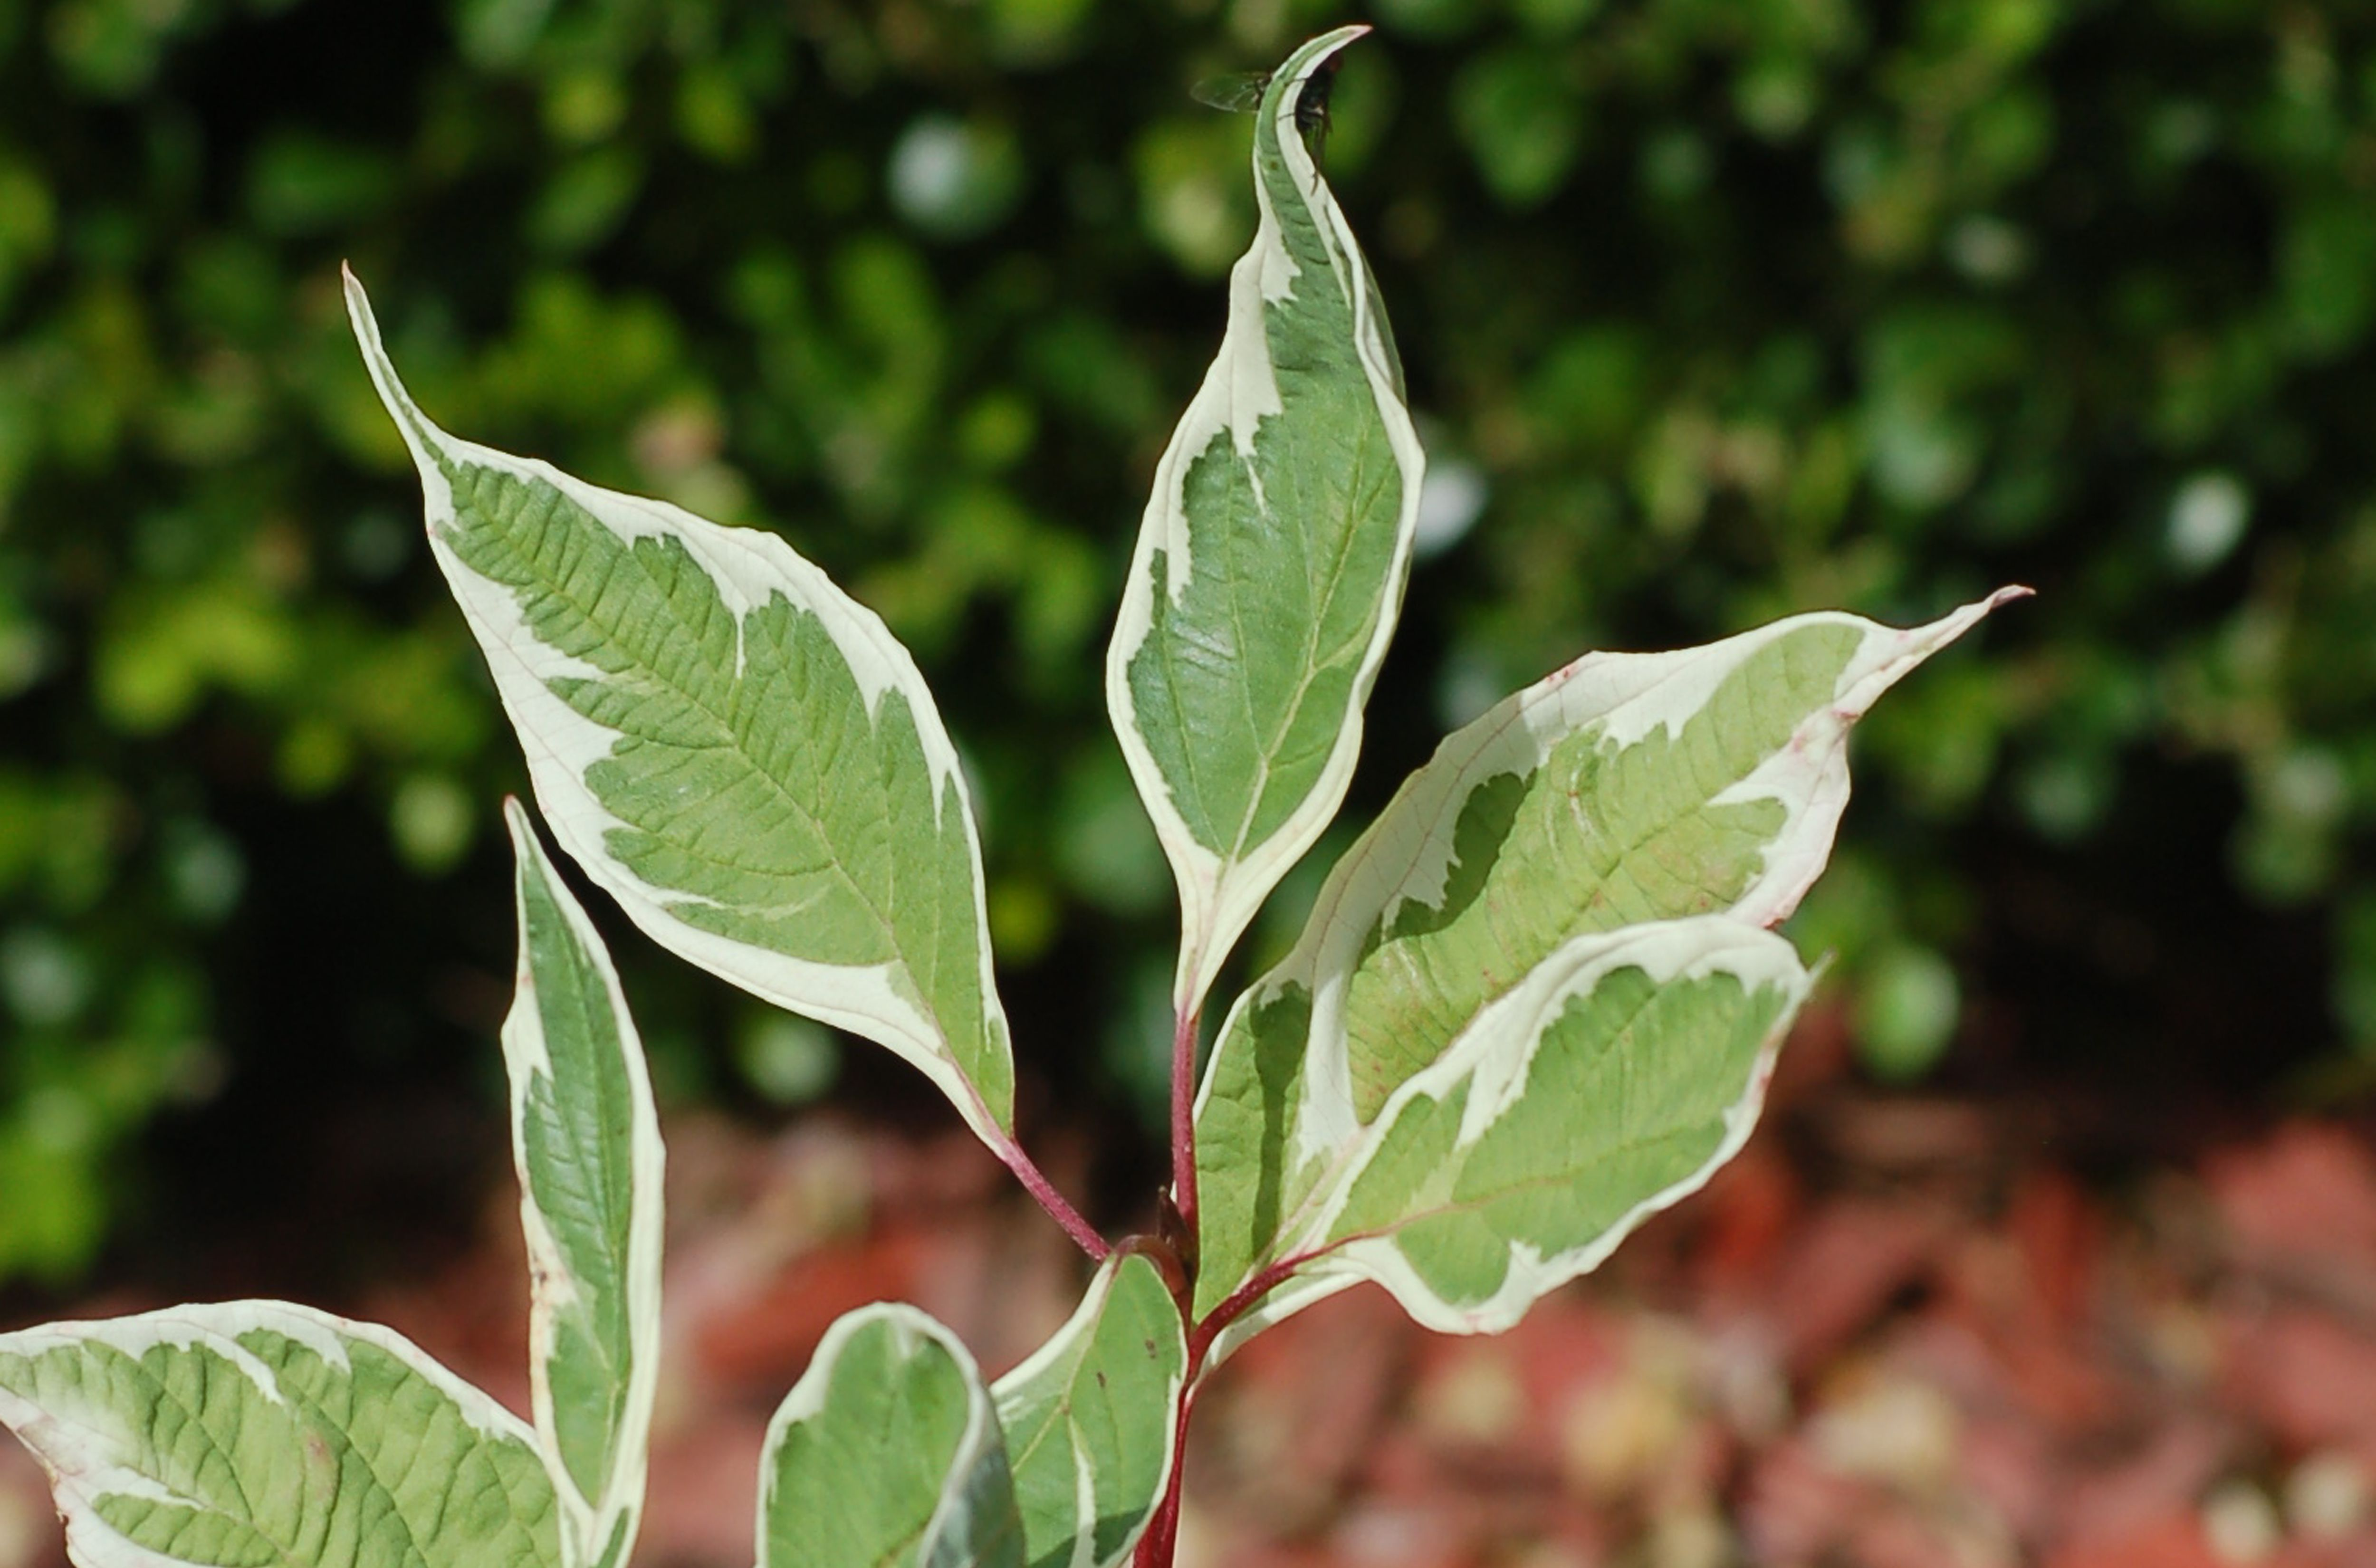 Closeup of variegated leaves of Elegantissima cultivar of redtwig dogwood.